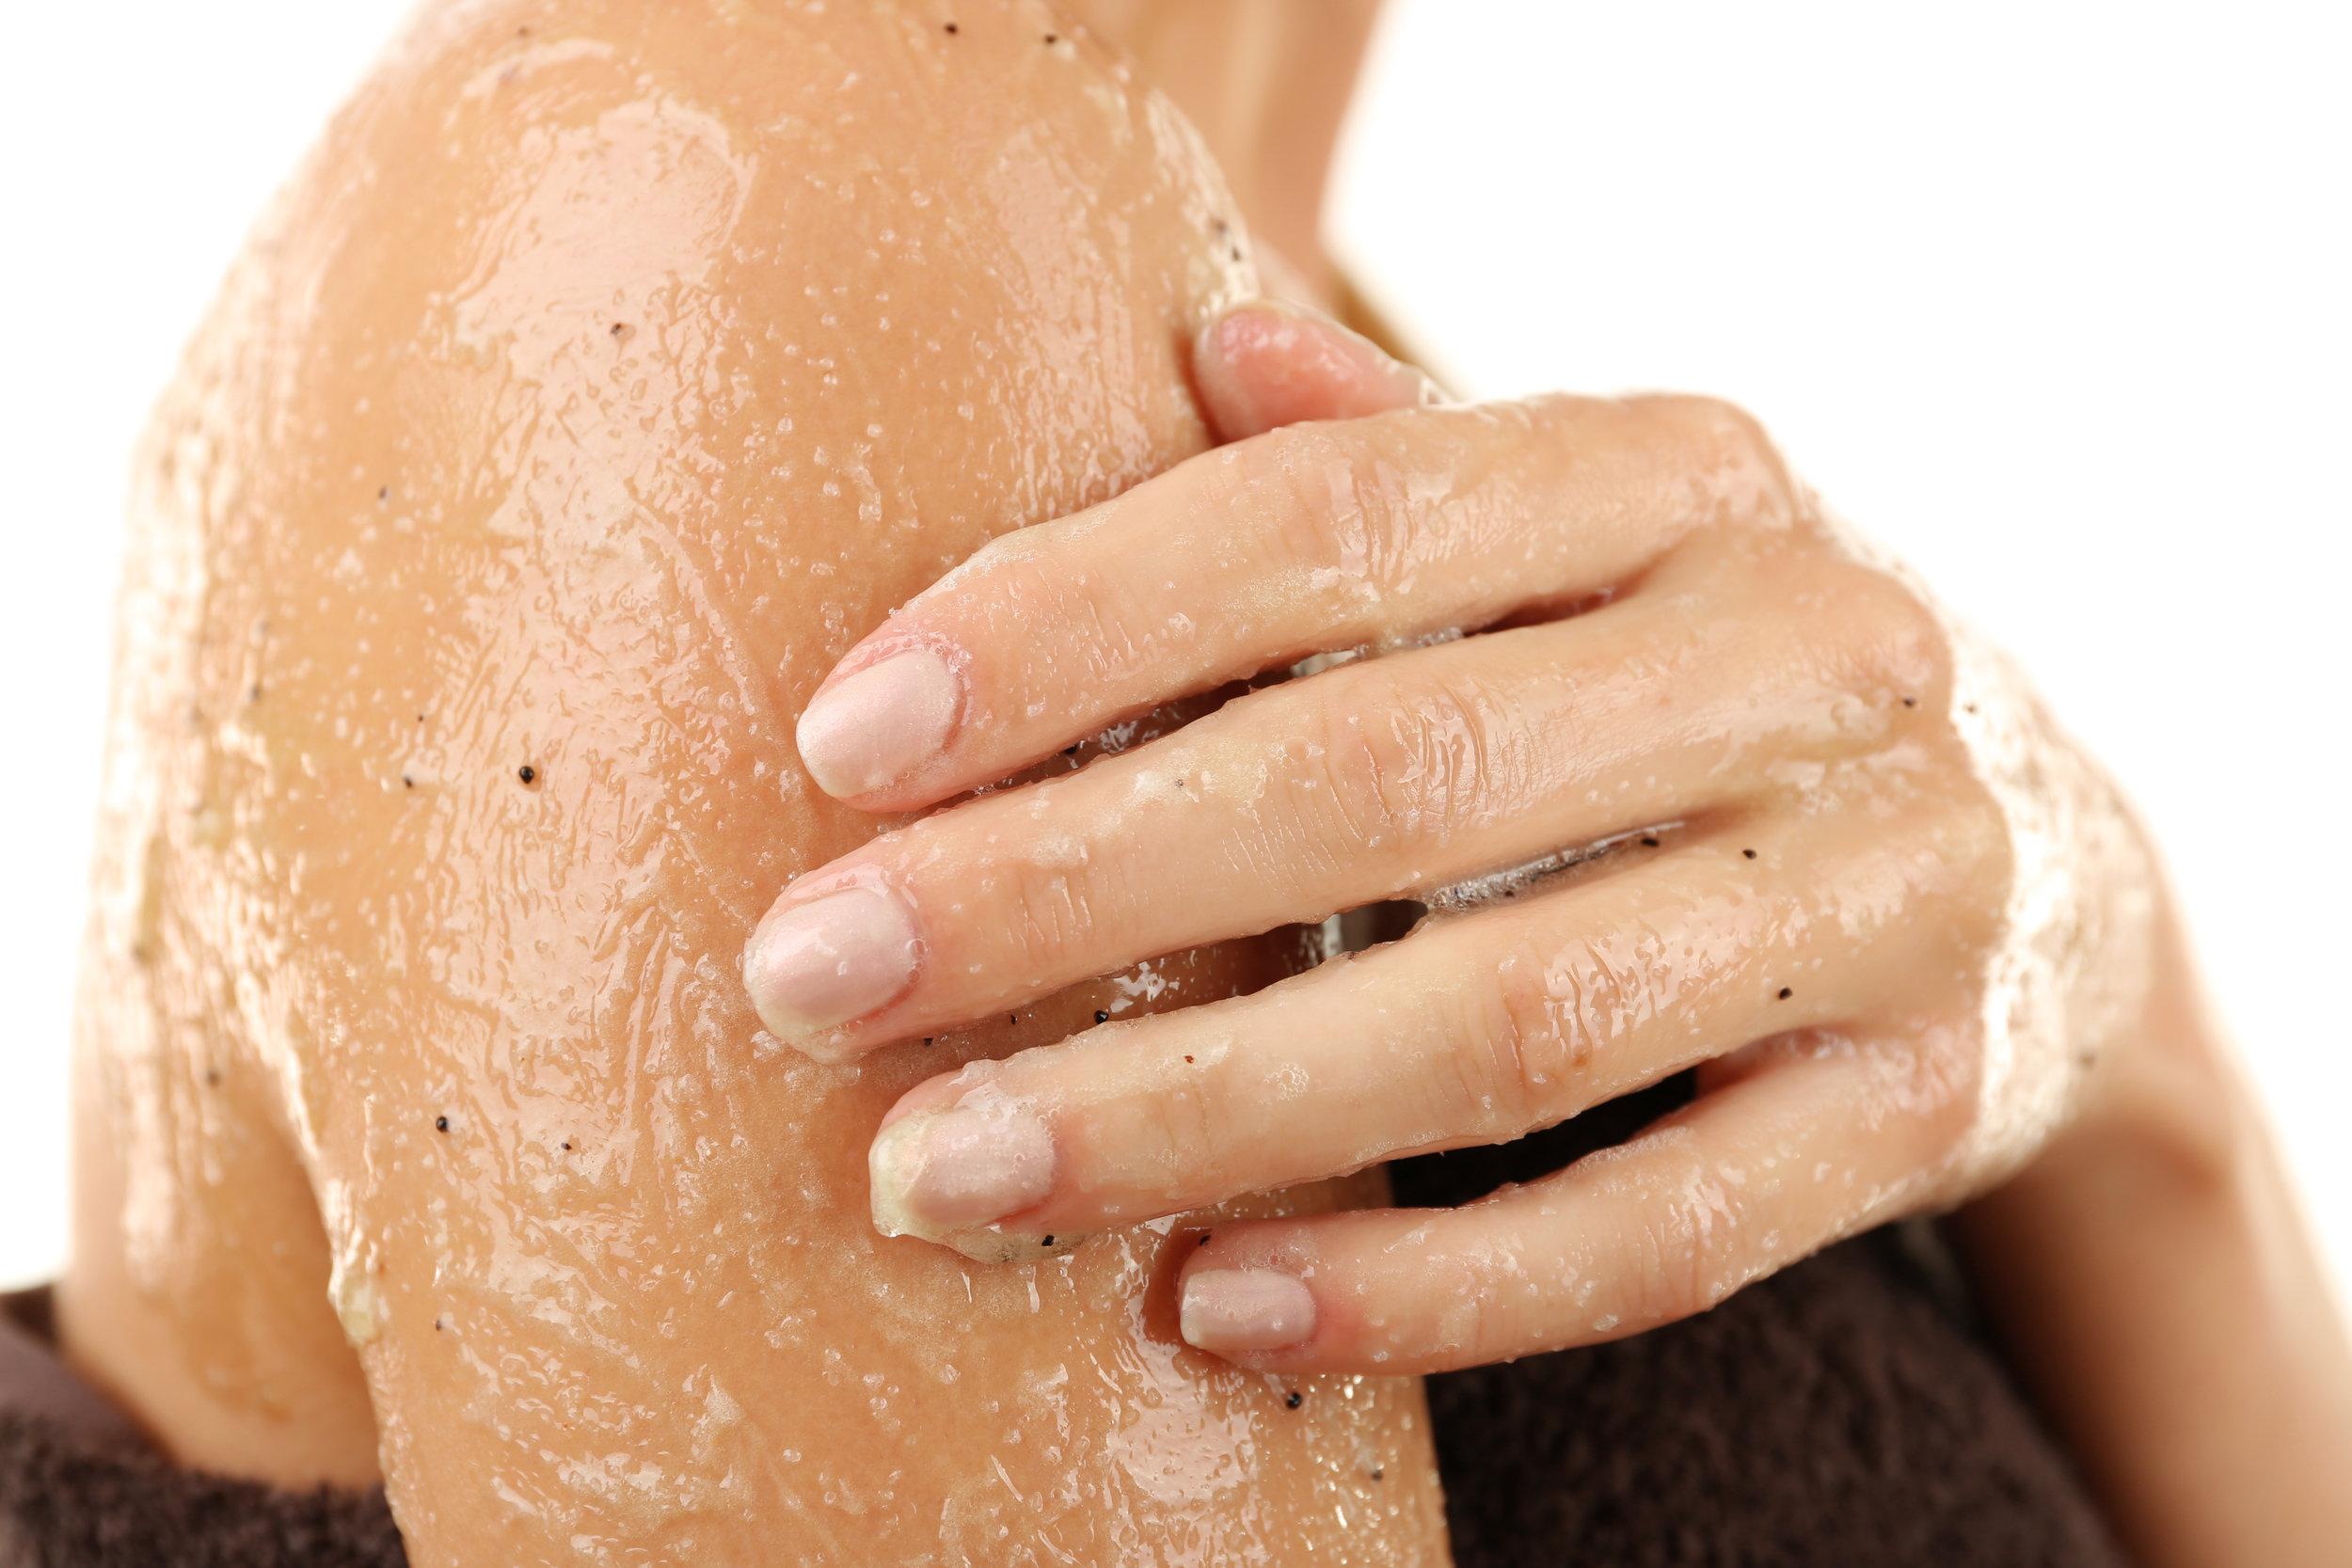 Woman using body scrub isolated on white